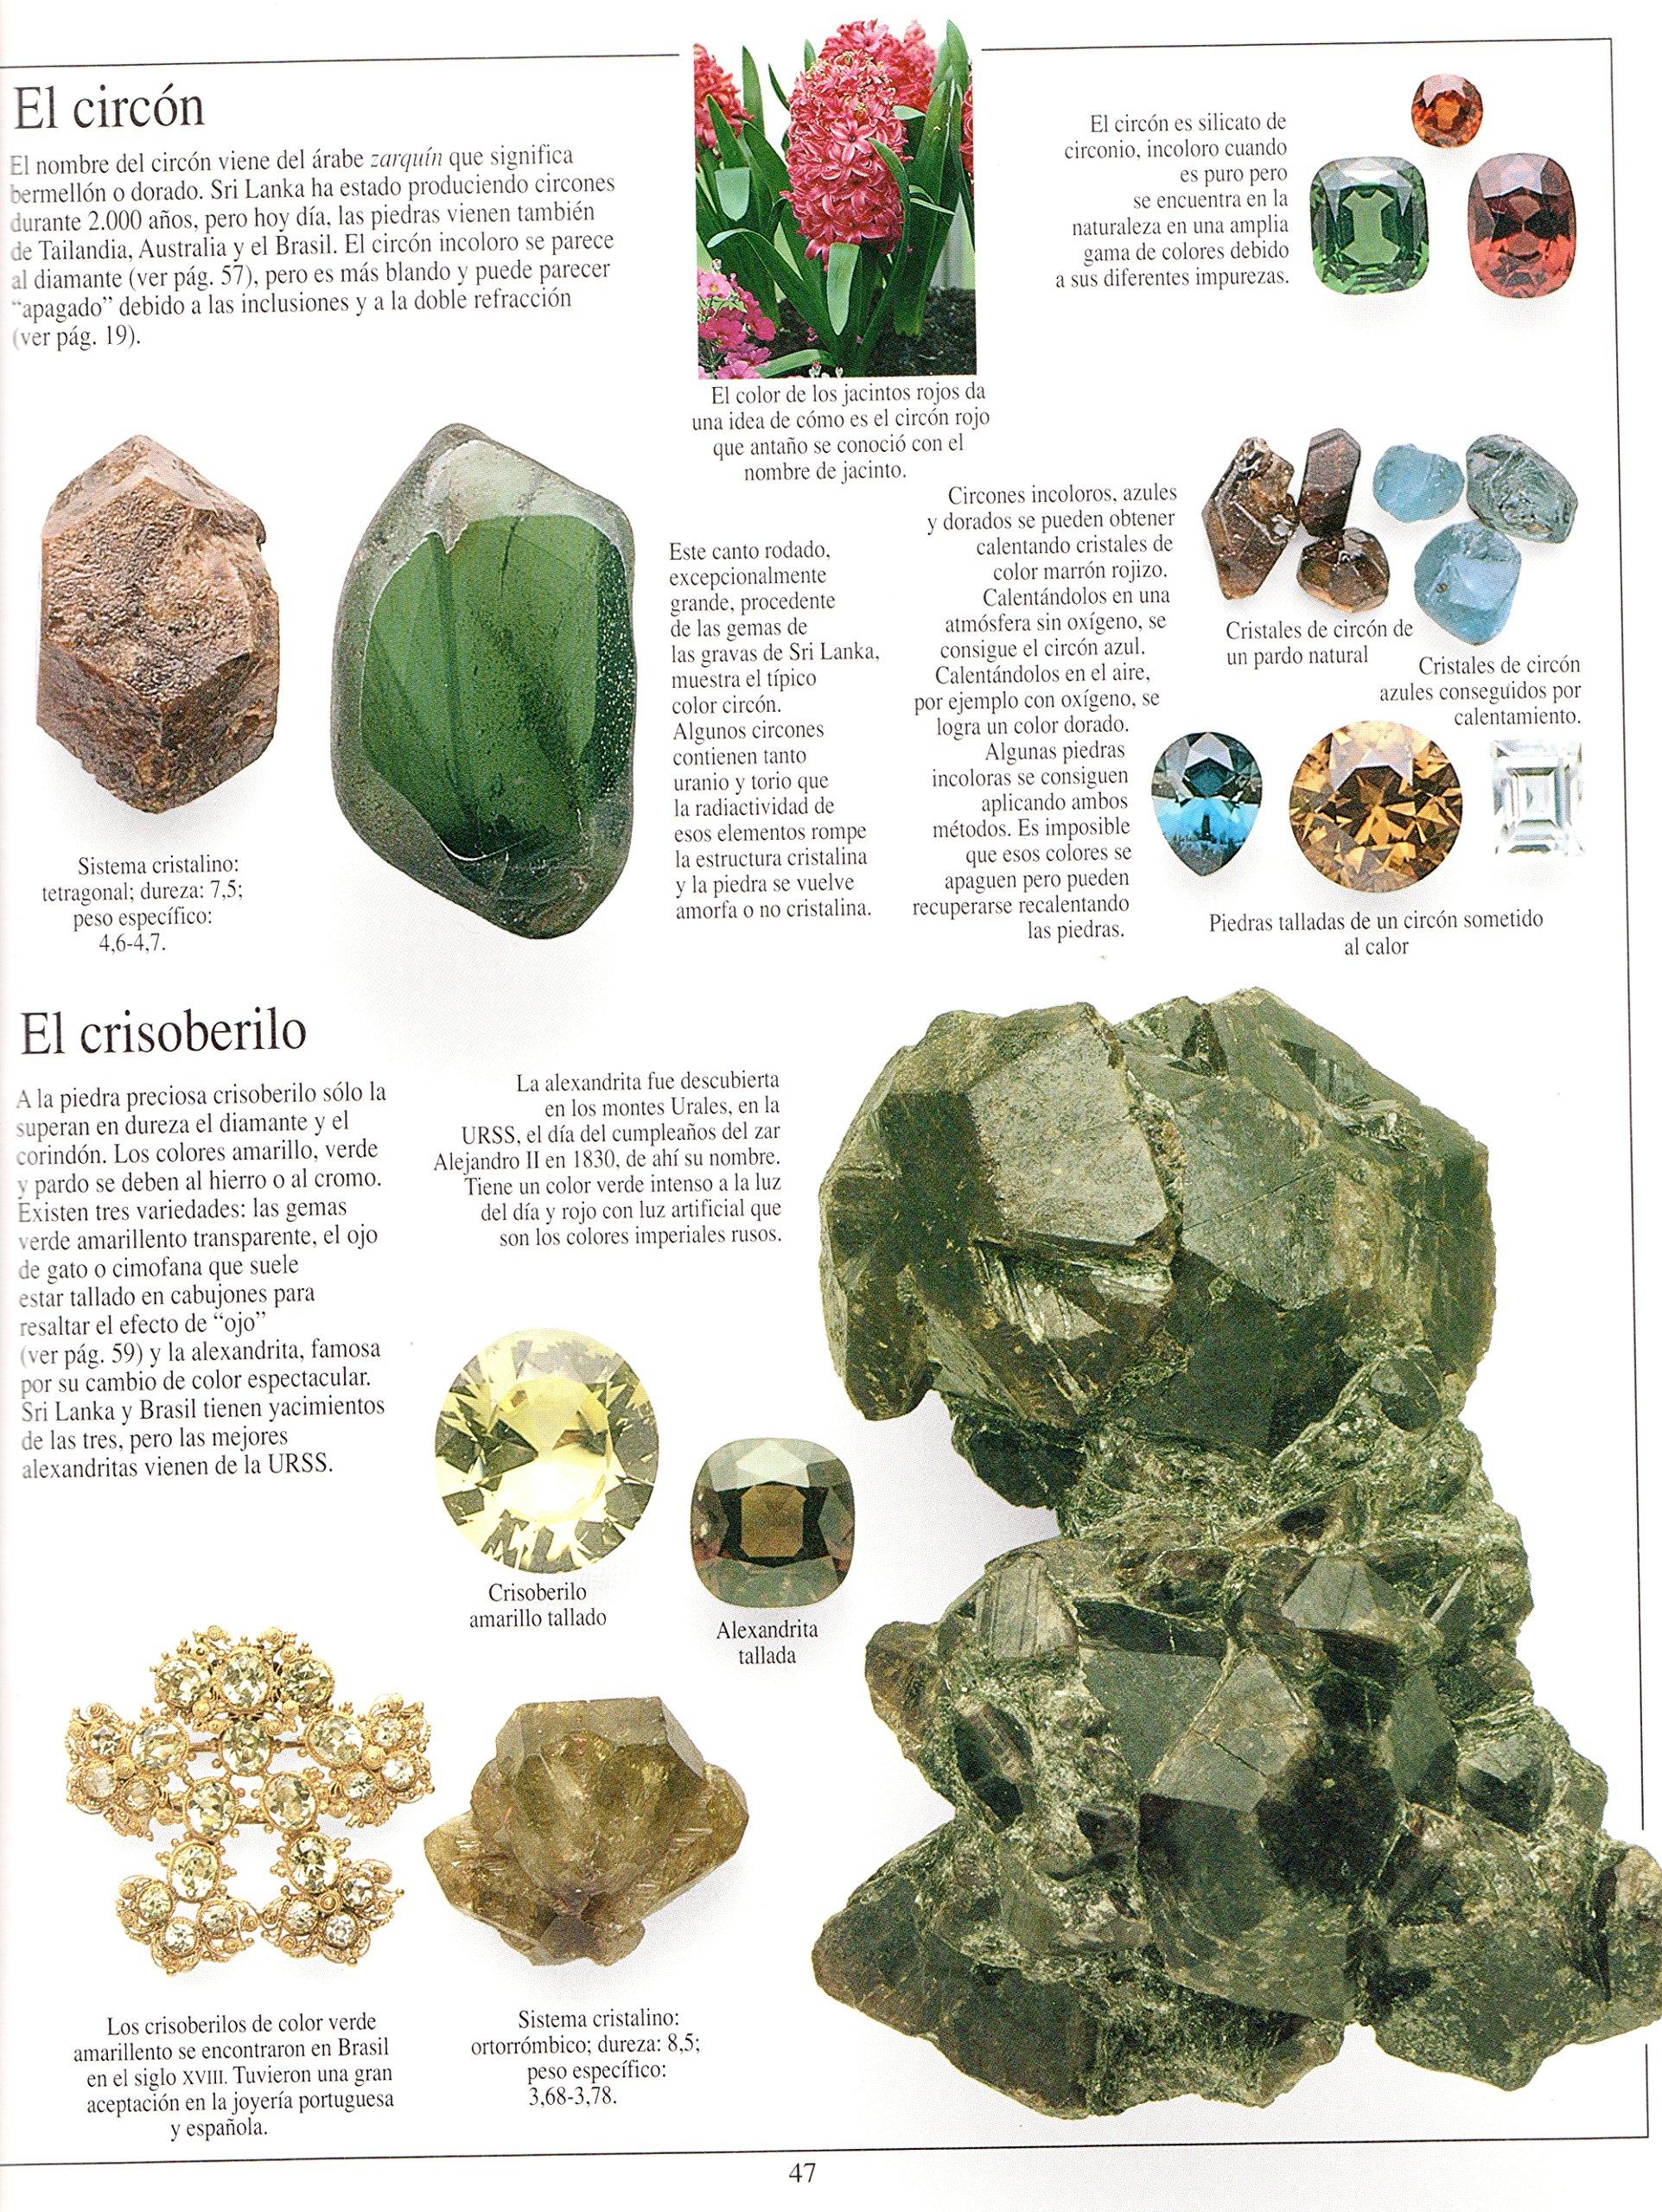 Piedras Preciosas y Joyas: R. F. Symes, R. R. Harding: 9788437237589: Amazon.com: Books